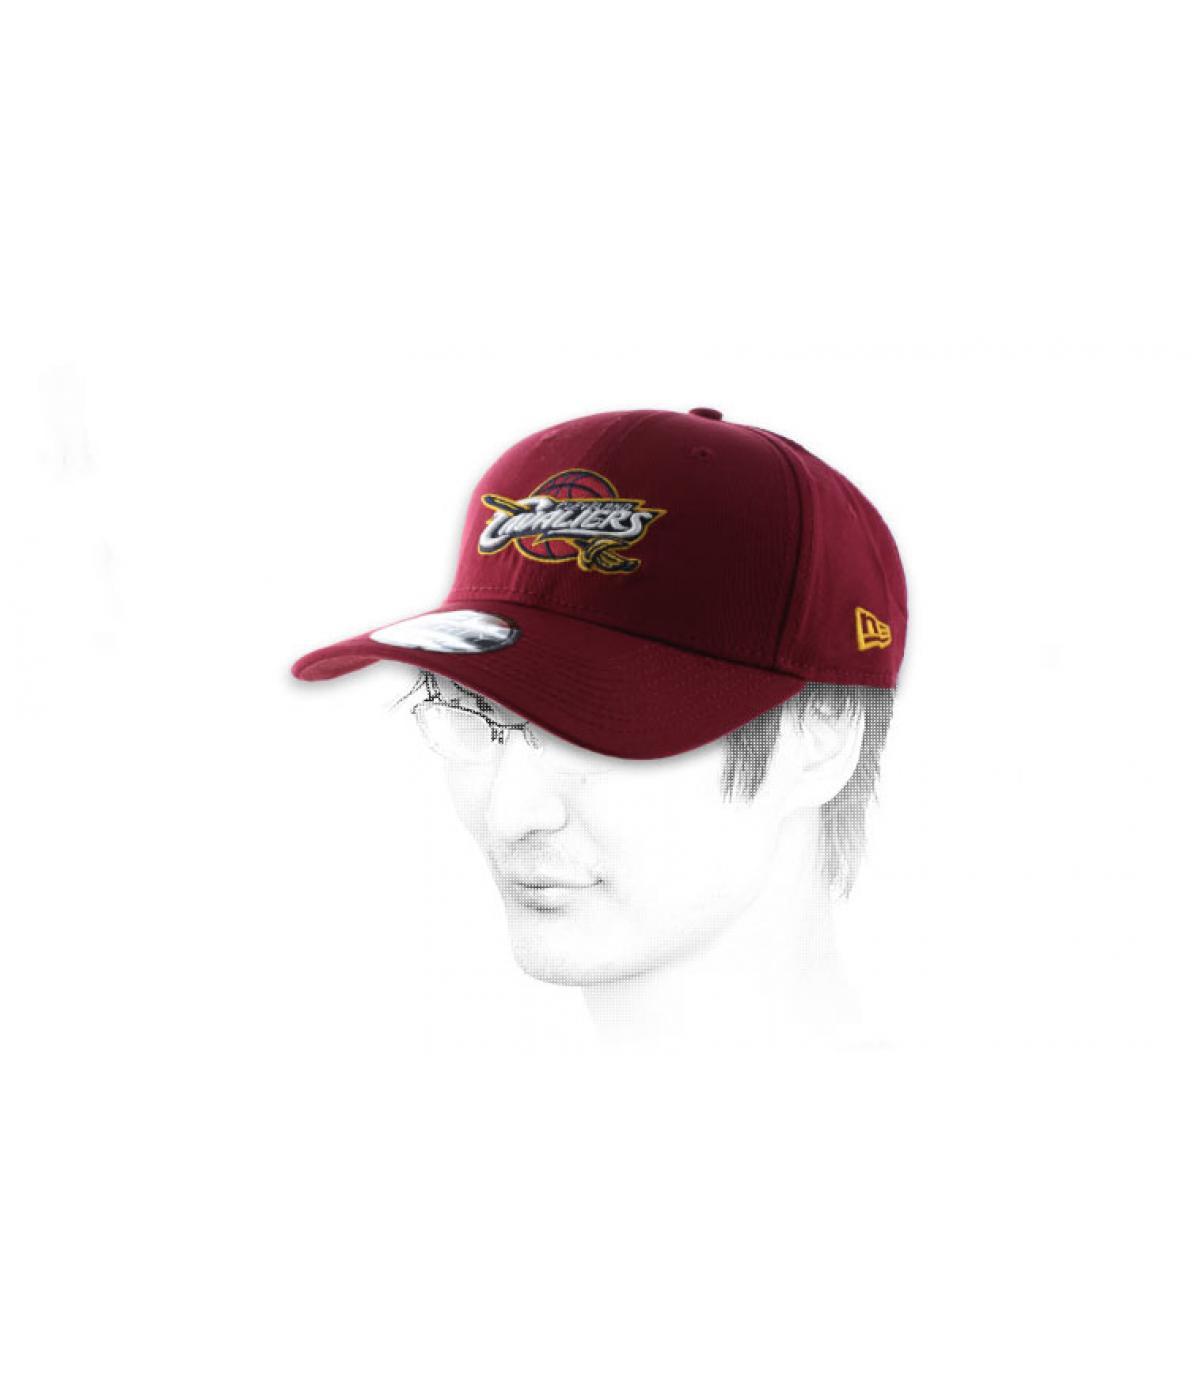 Cleveland Cavaliers cap